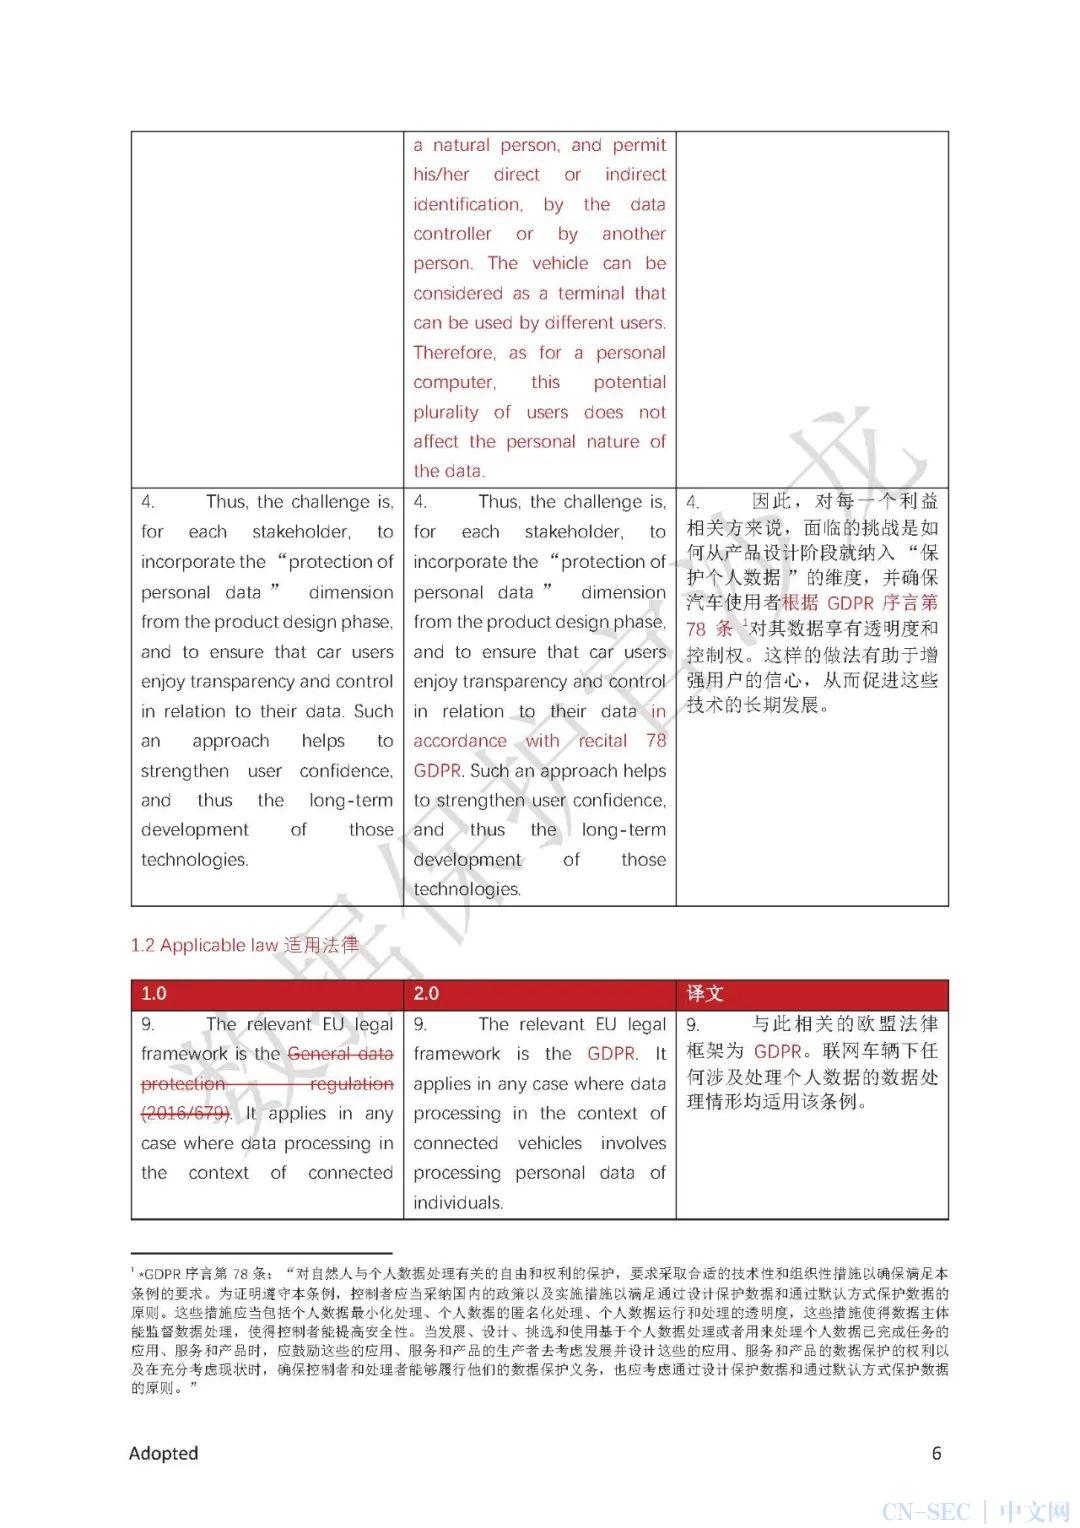 EDPB《车联网个人数据保护指南2.0》比较翻译(DPO社群出品)